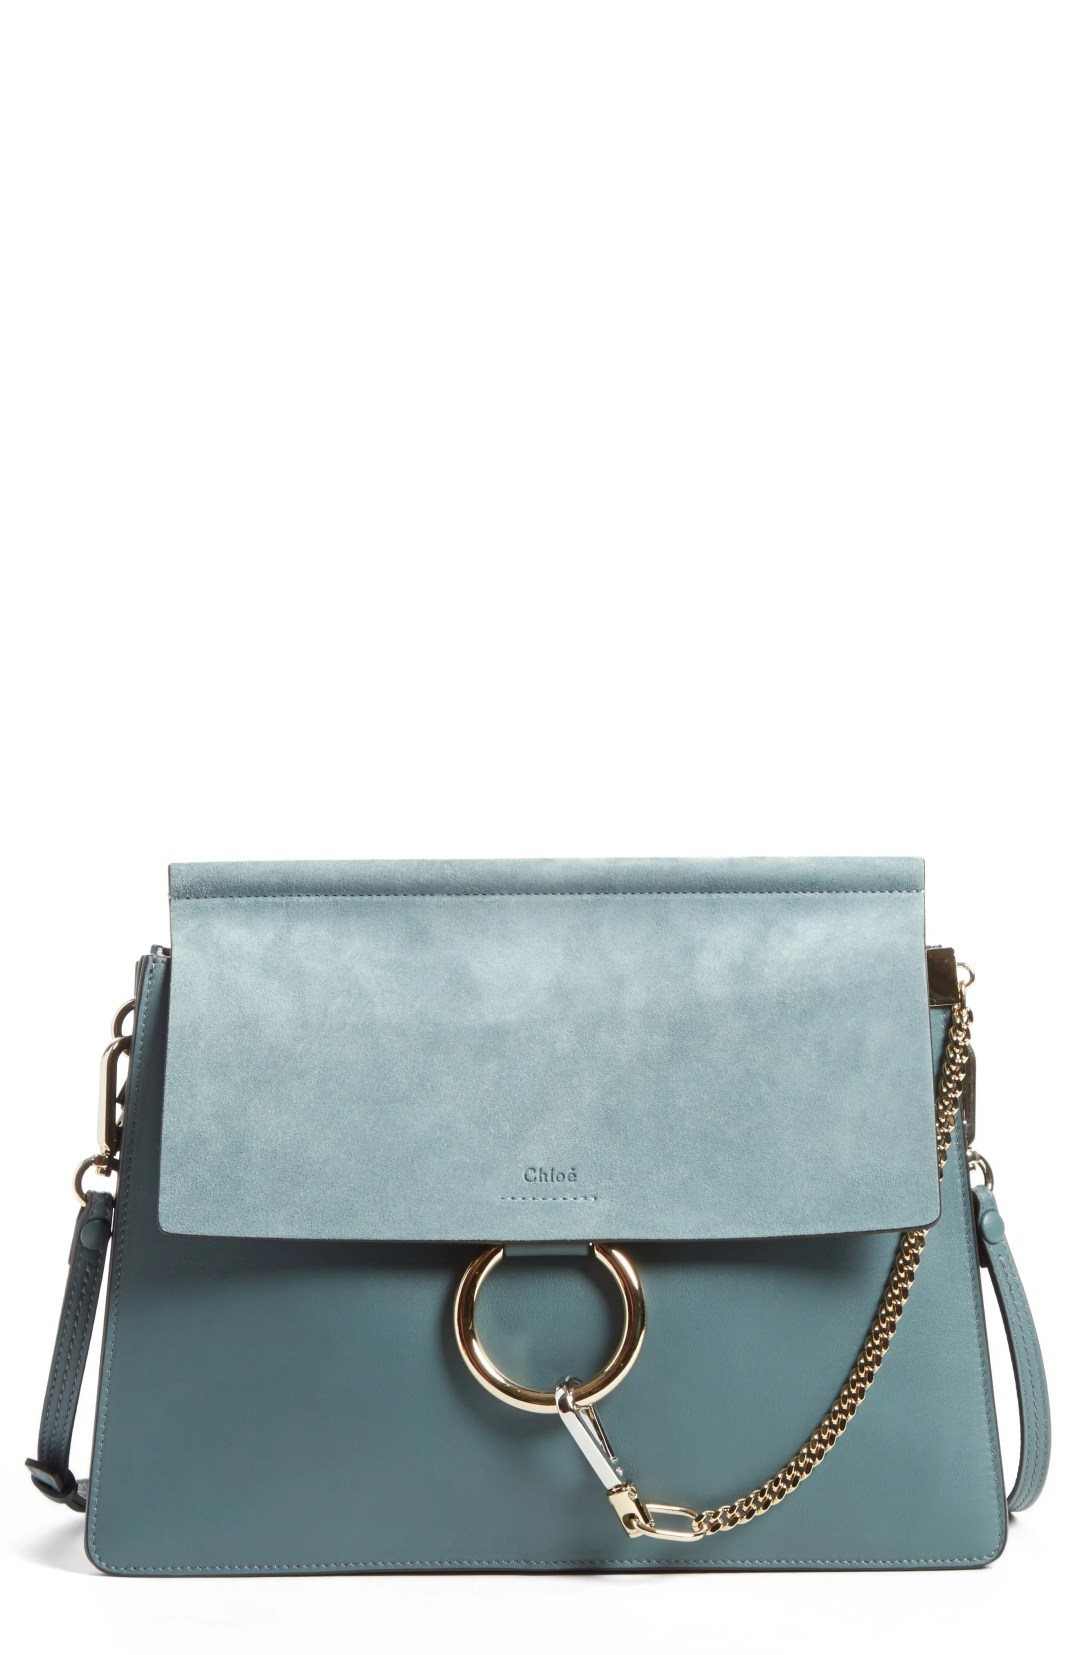 Chloé Faye Suede   Leather Shoulder Bag 943b828f700d8